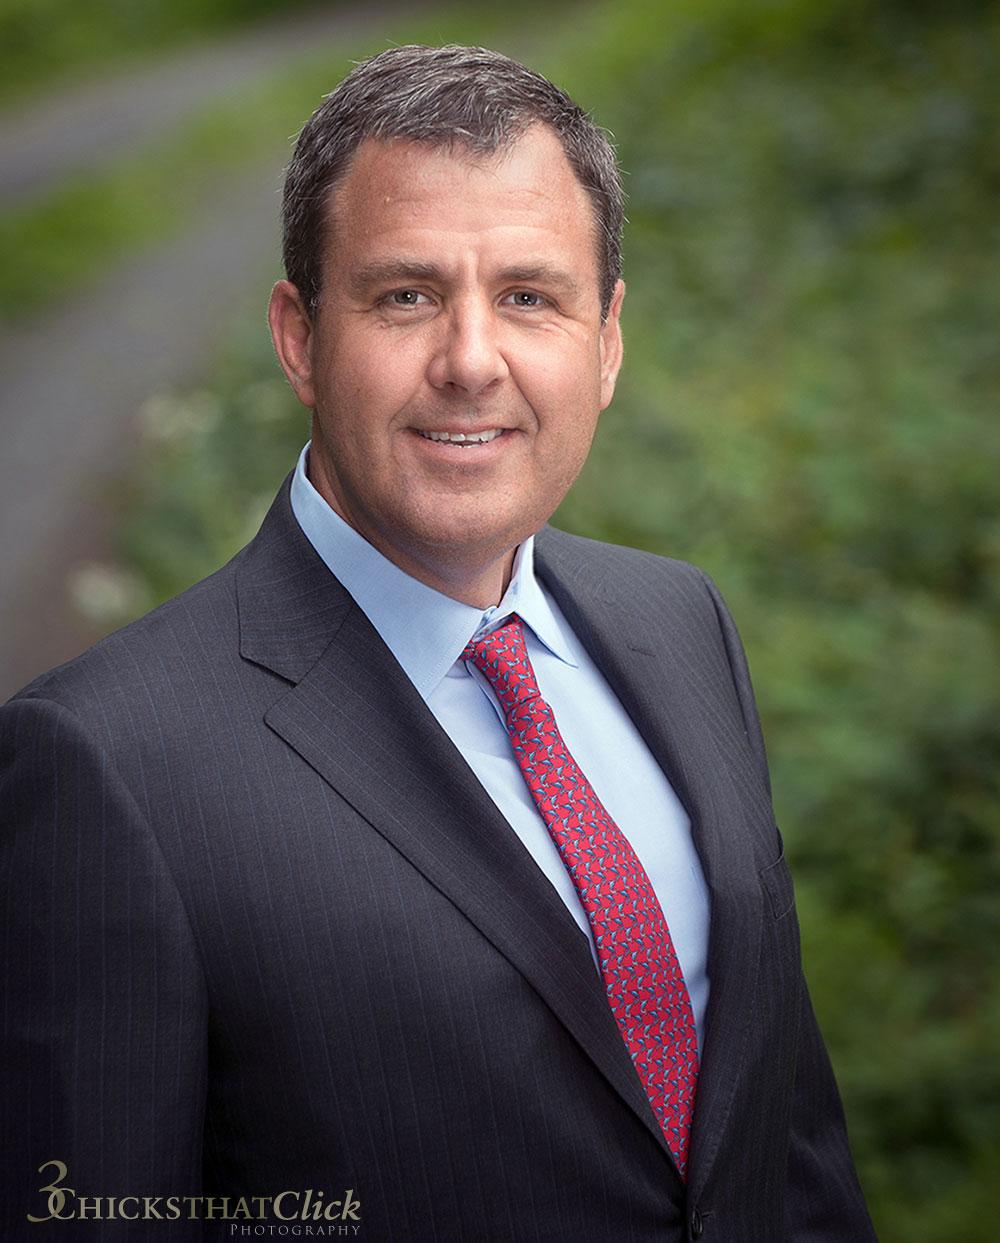 Glen Hofferber